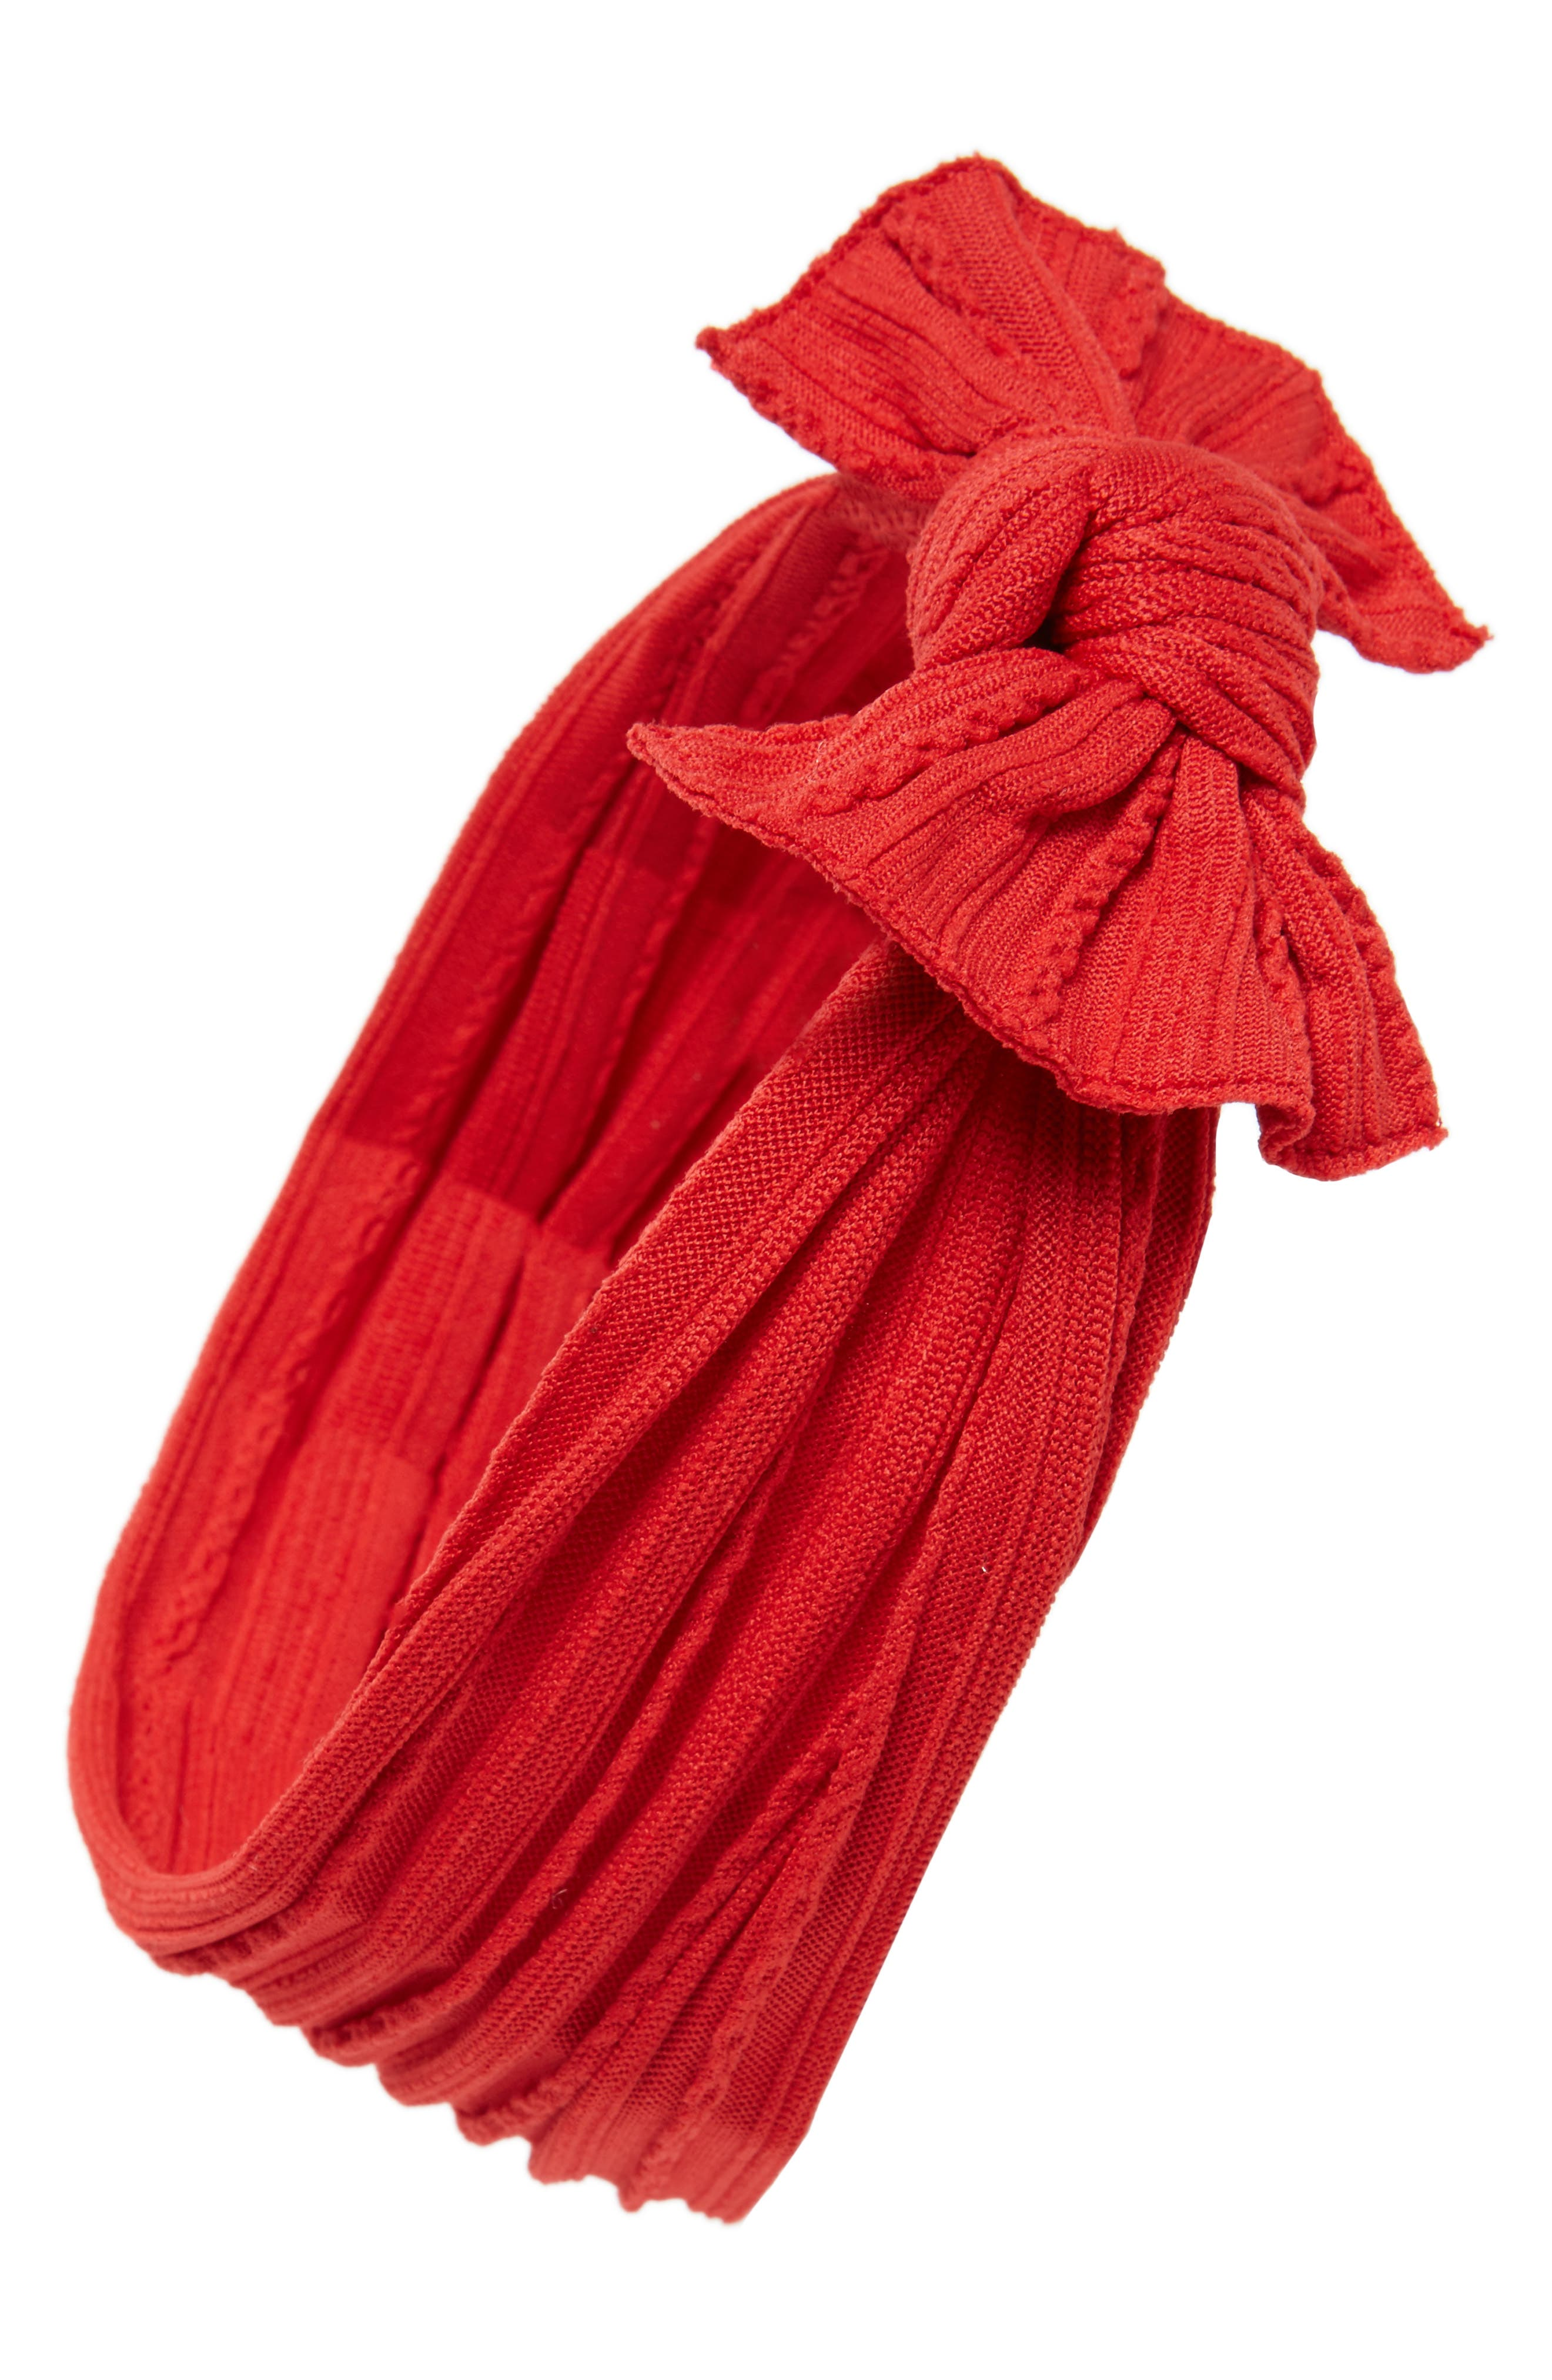 Cable Knot Headband,                             Main thumbnail 1, color,                             CHERRY